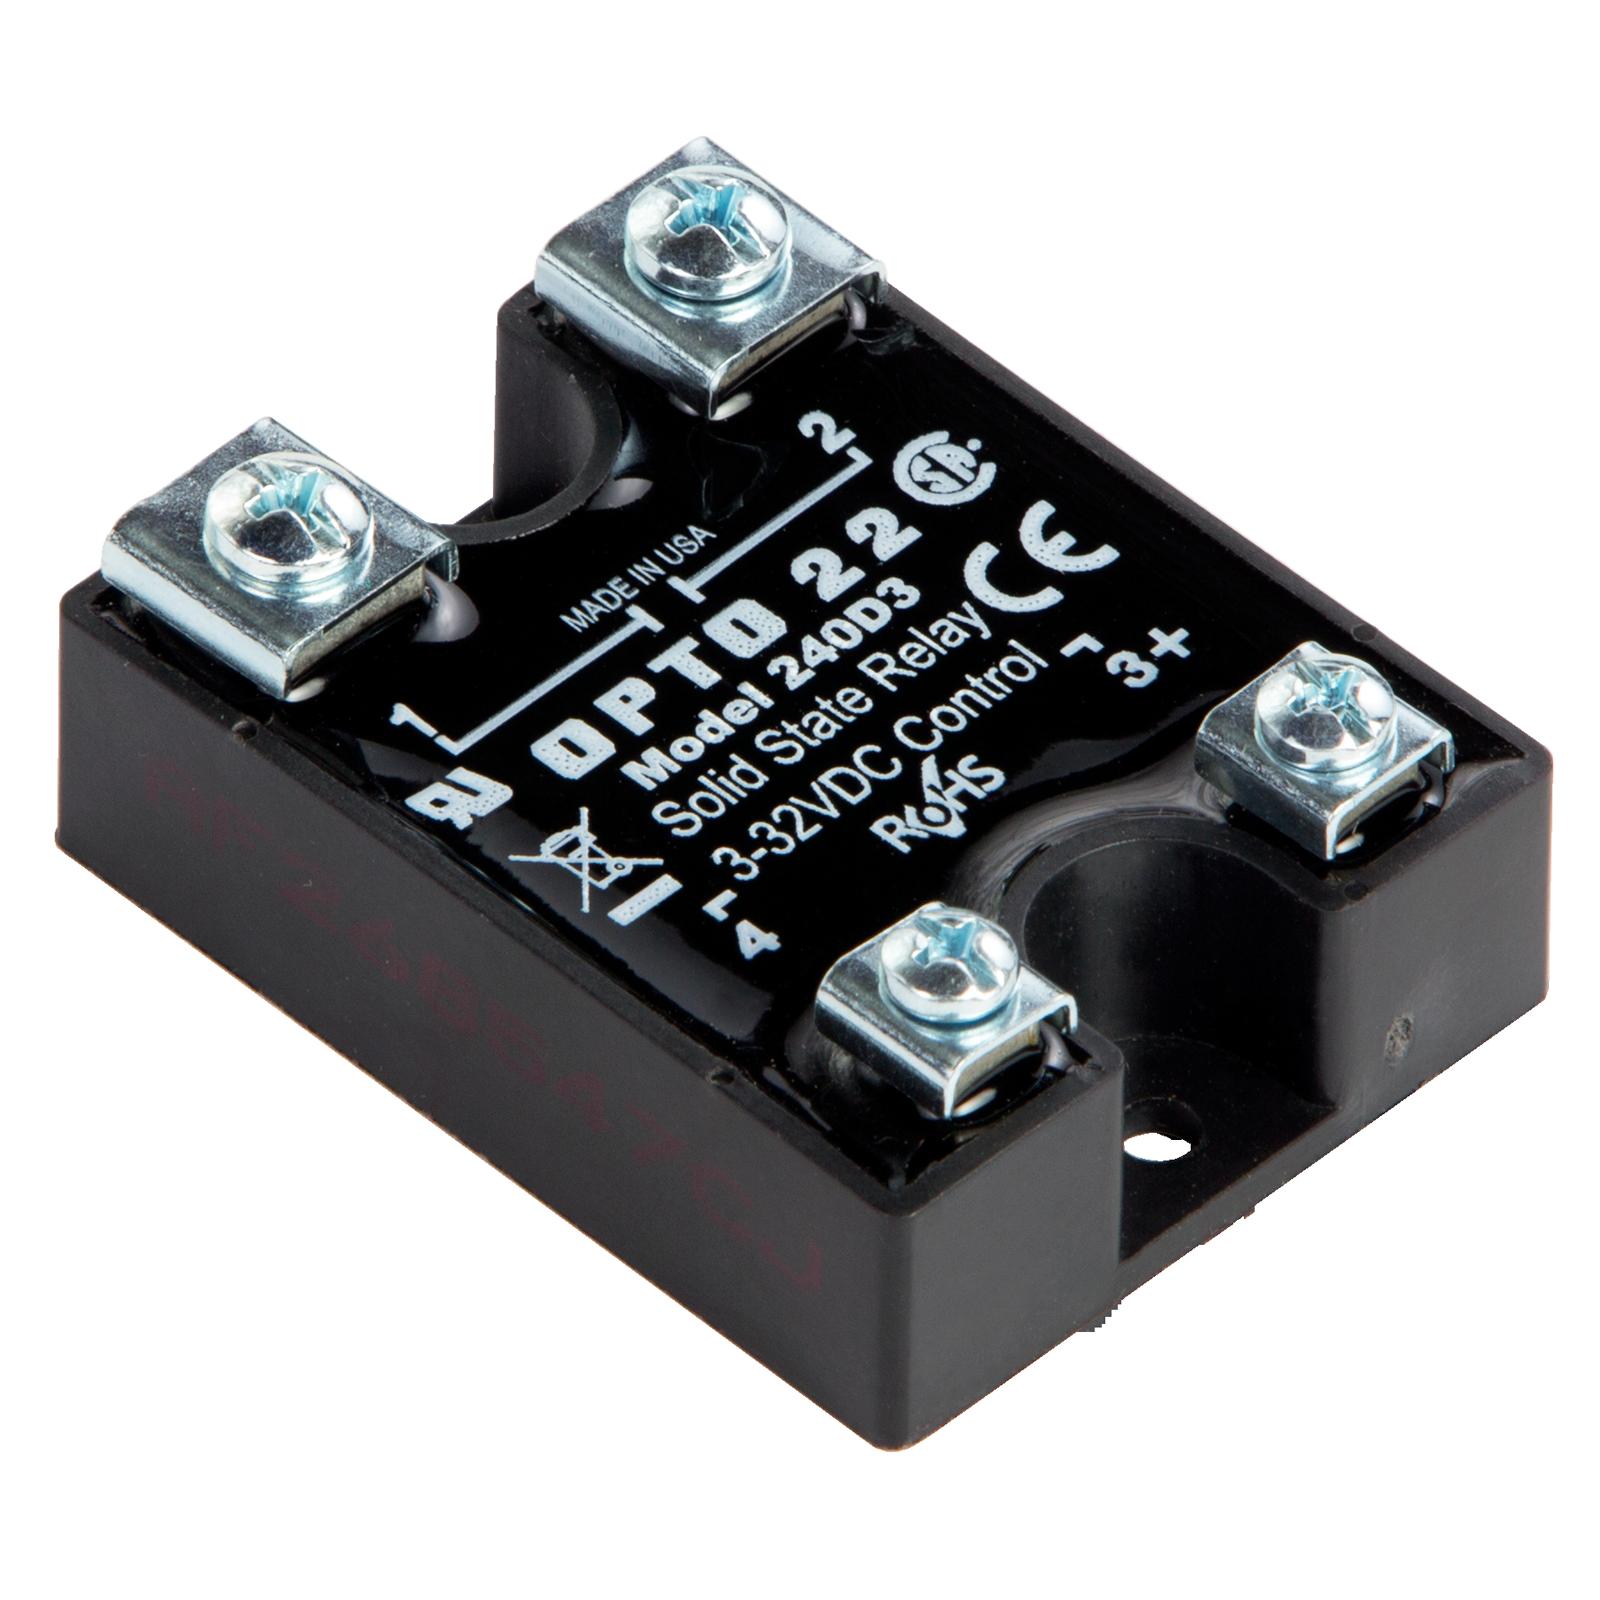 ssr control 240 vac schematic opto22 240d3    240       vac     3 amp  dc    control    solid state  opto22 240d3    240       vac     3 amp  dc    control    solid state